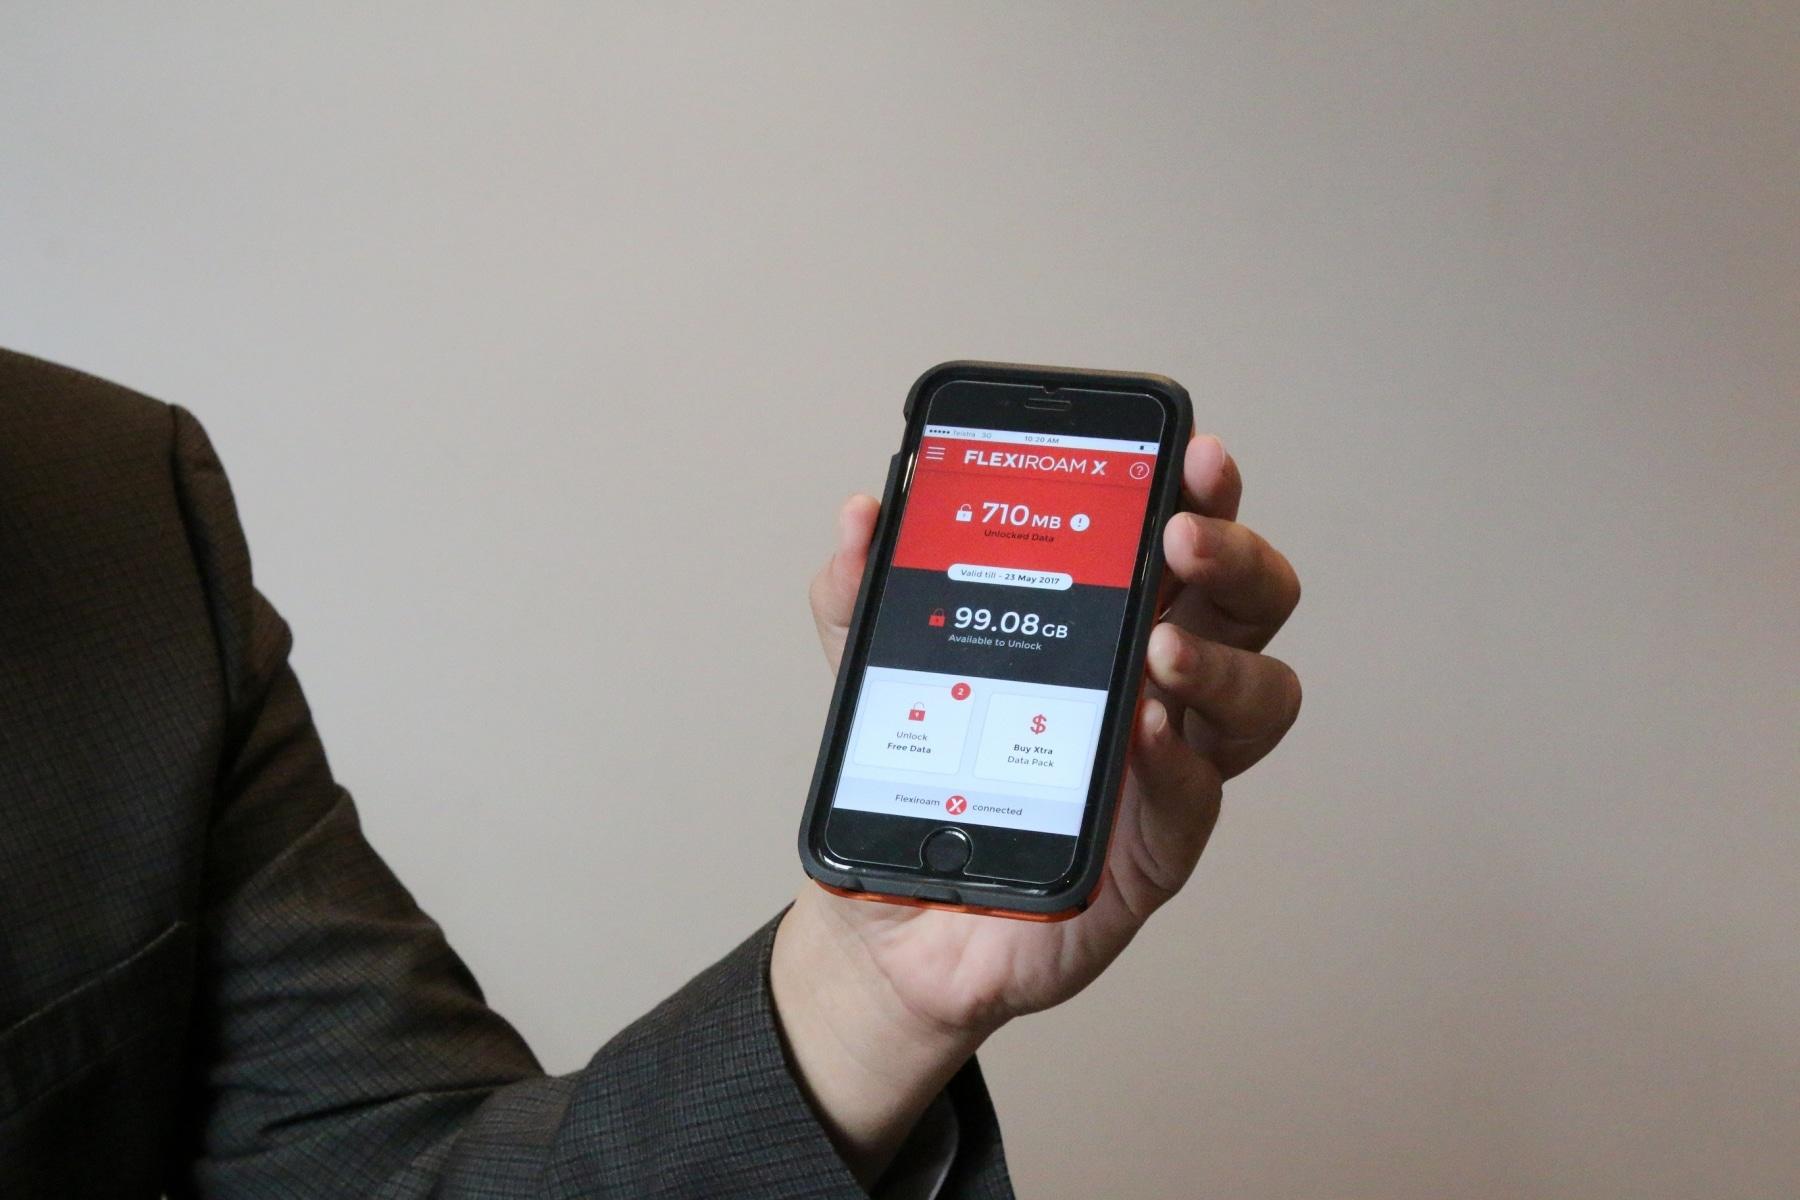 flexiroam x app unlock data